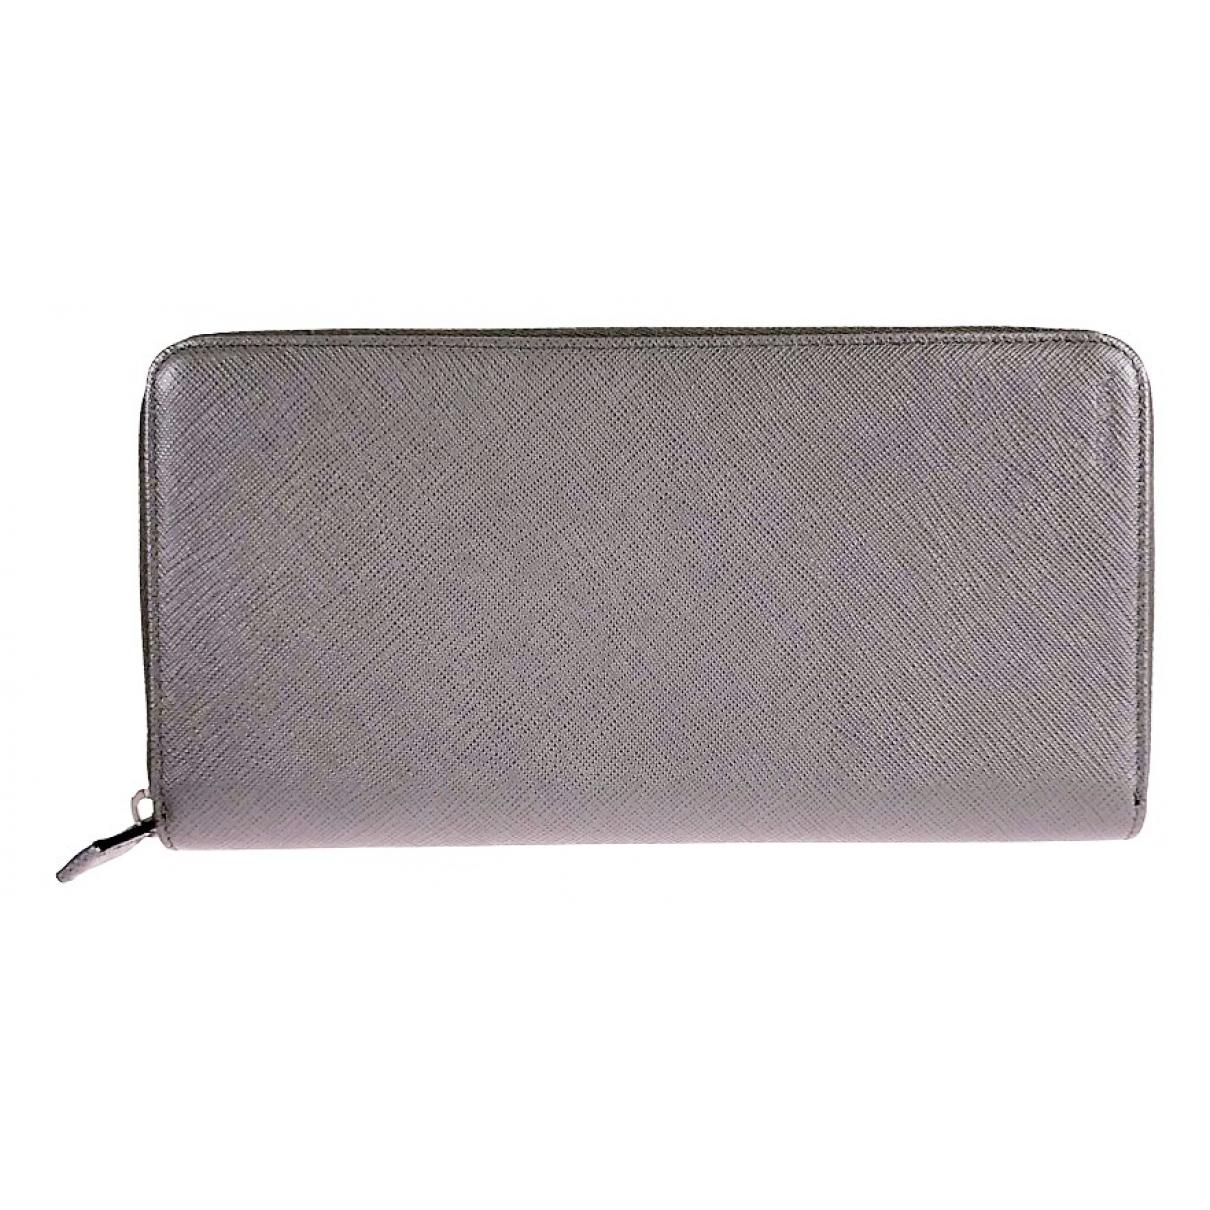 Prada \N Grey Leather Small bag, wallet & cases for Men \N